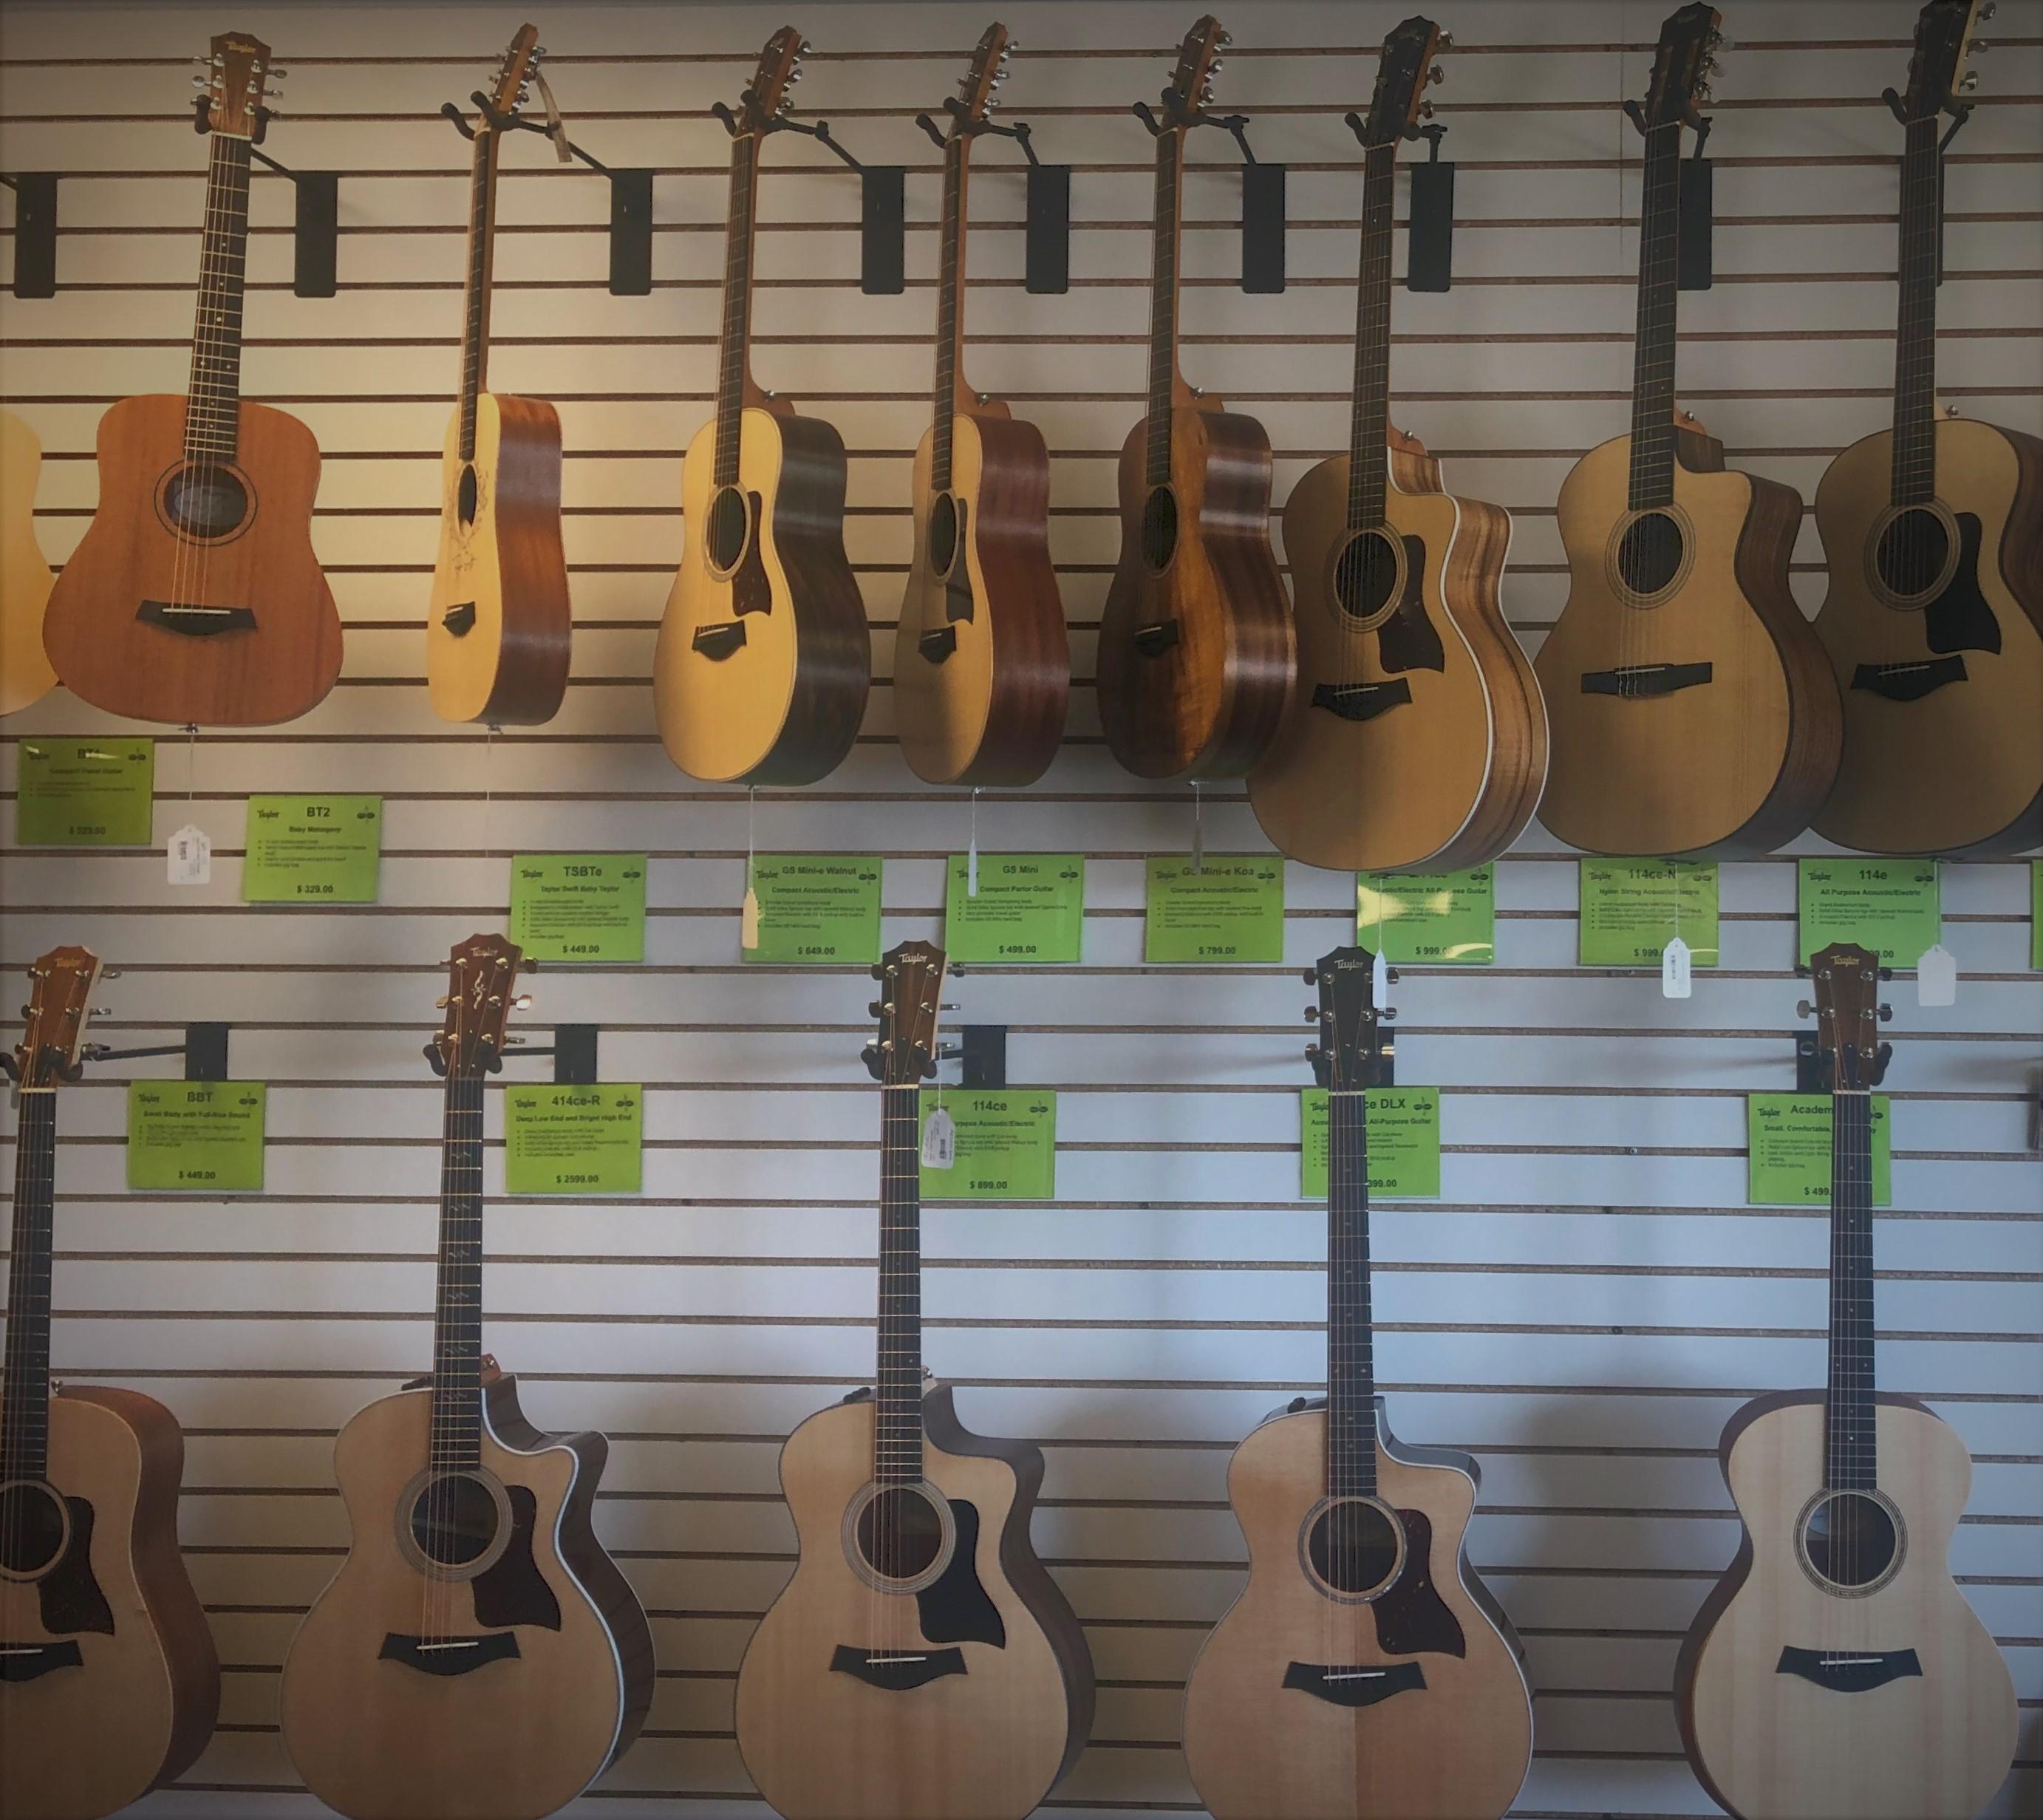 Taylor Guitar display